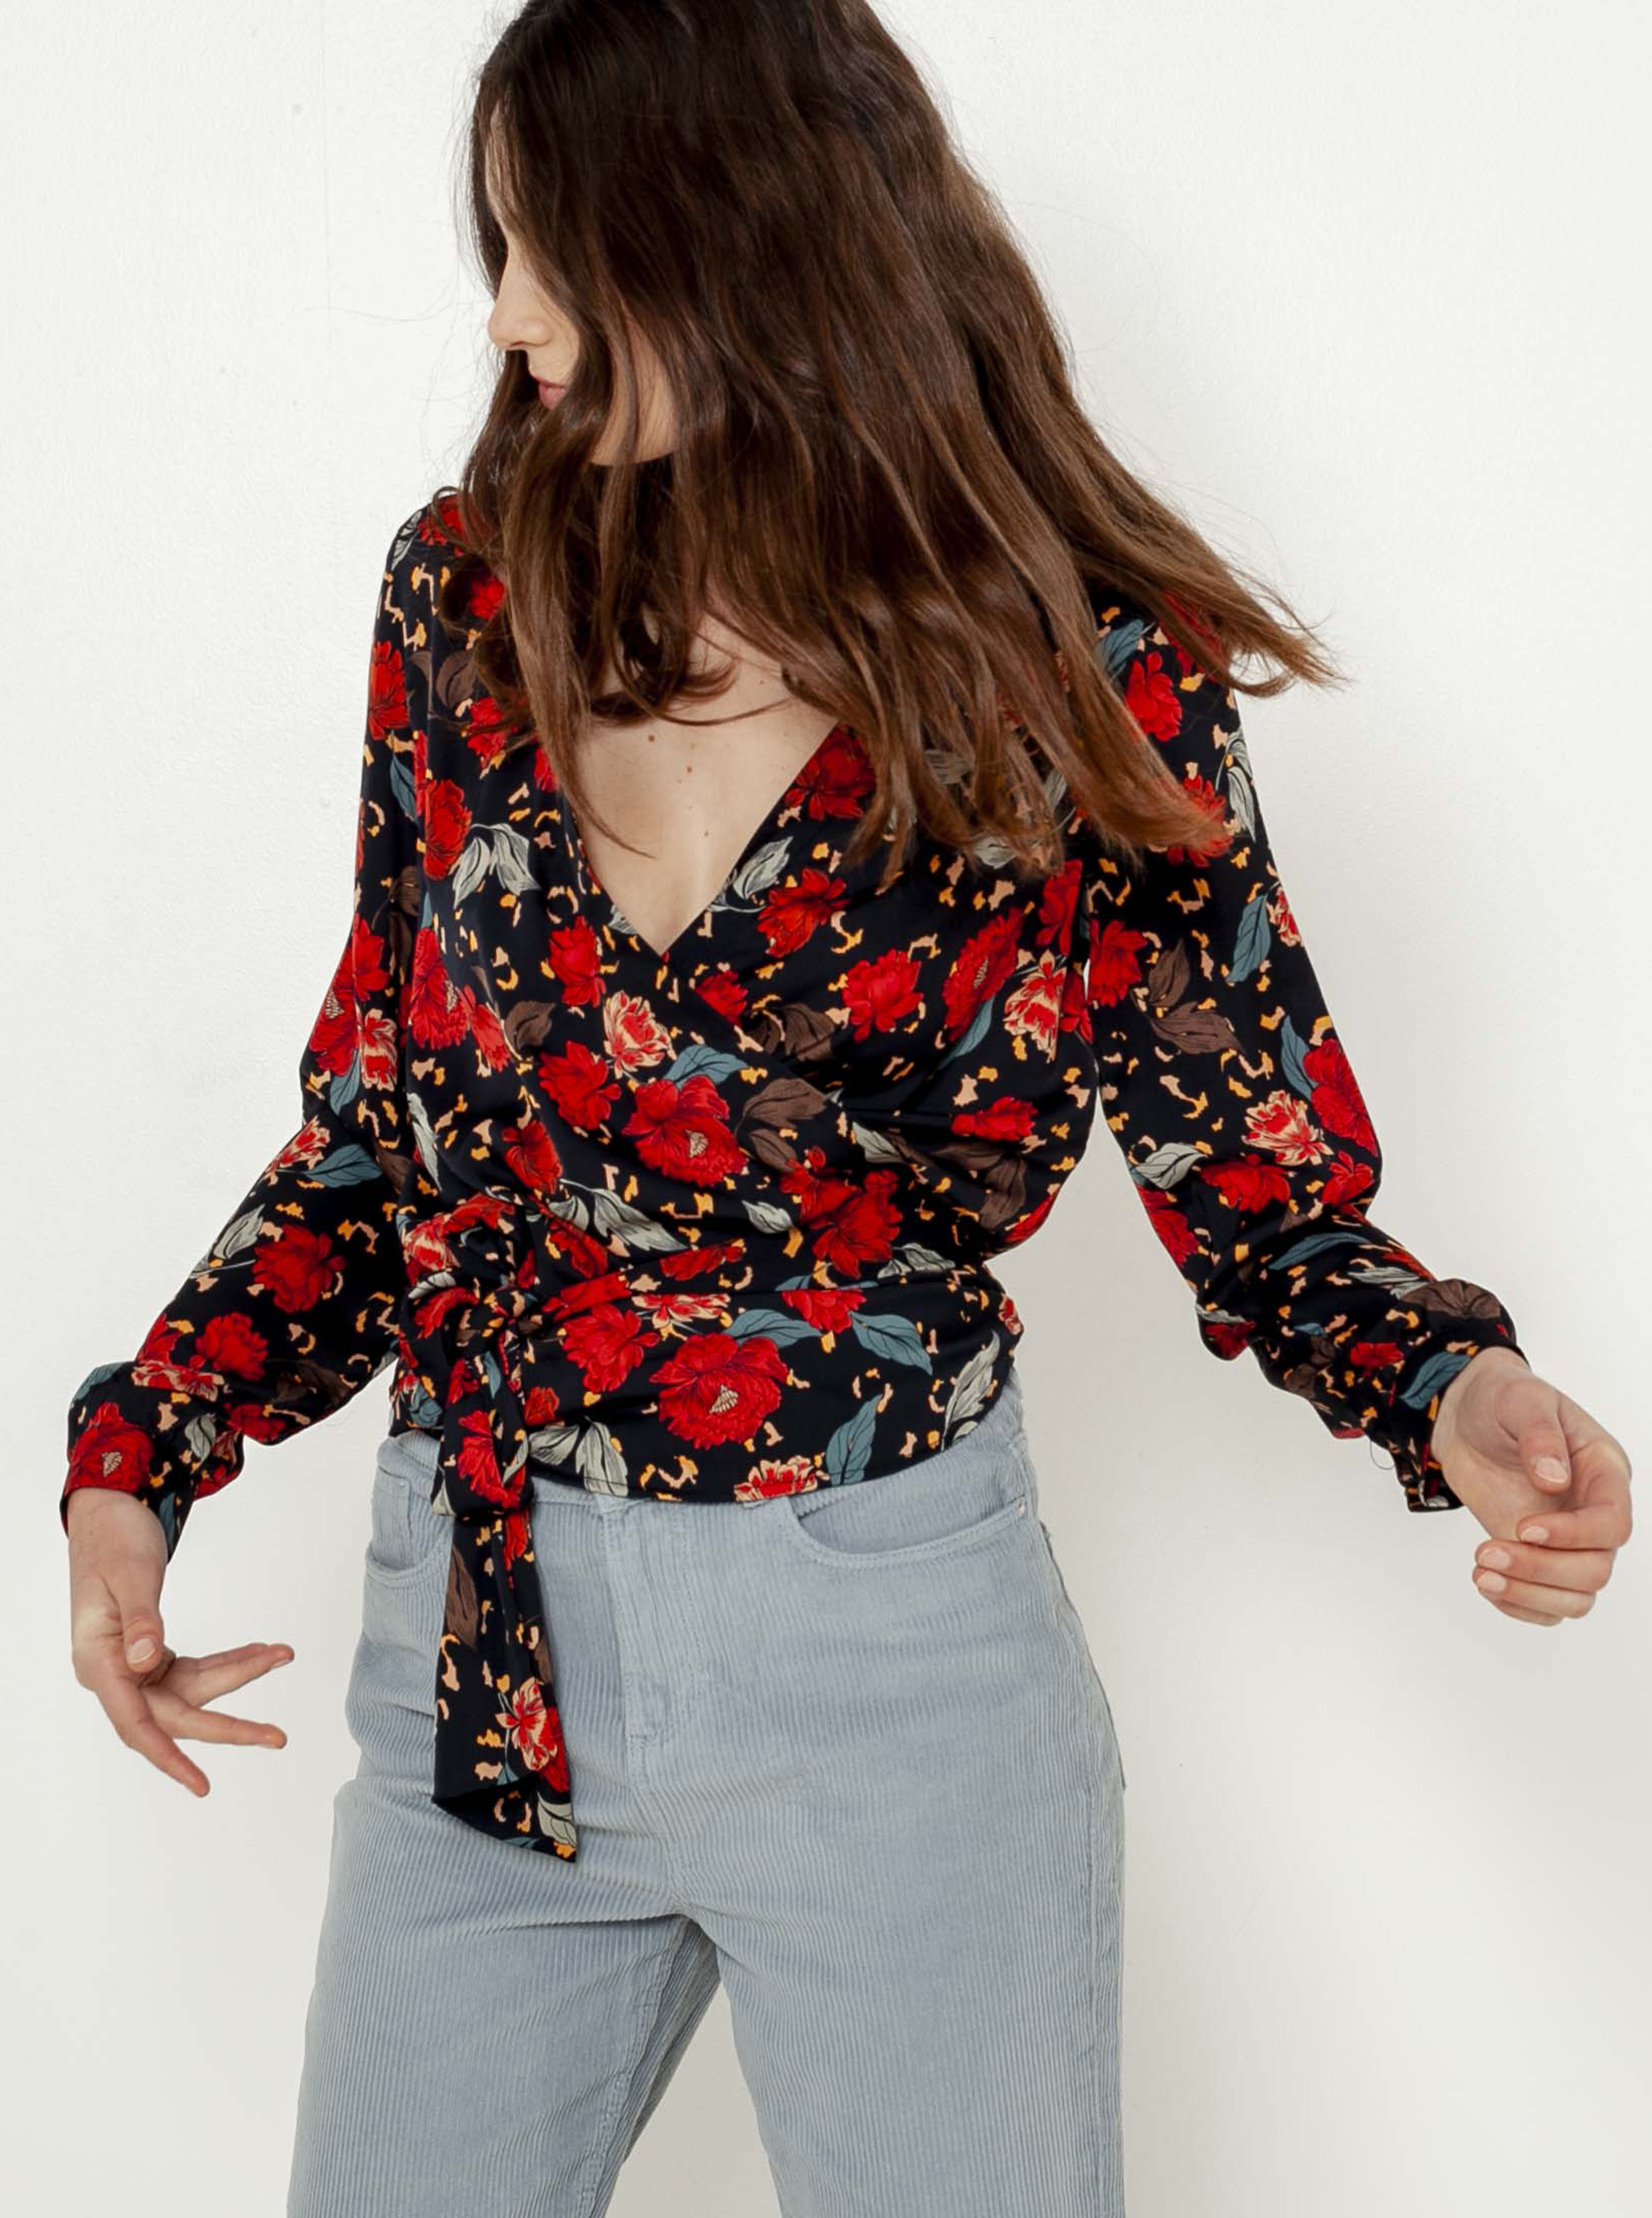 CAMAIEU crna bluza s cvjetnim motivom